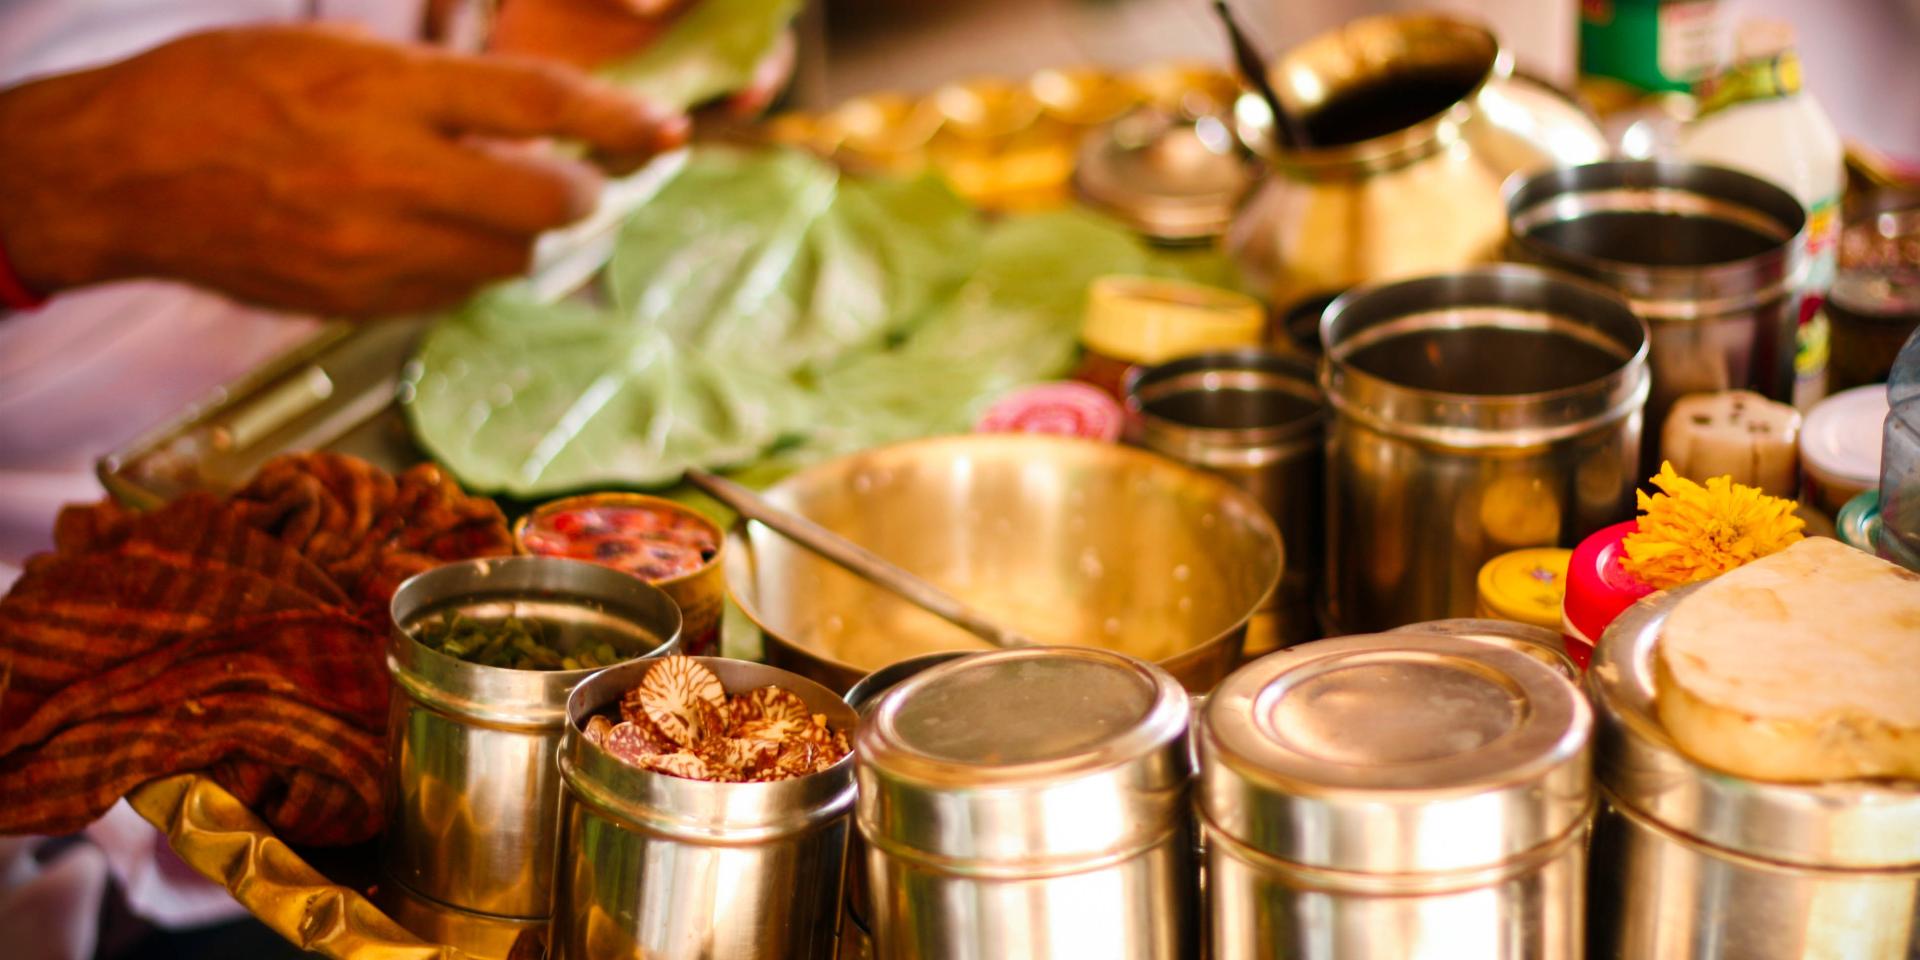 An individual prepares a meal in Kerala, India